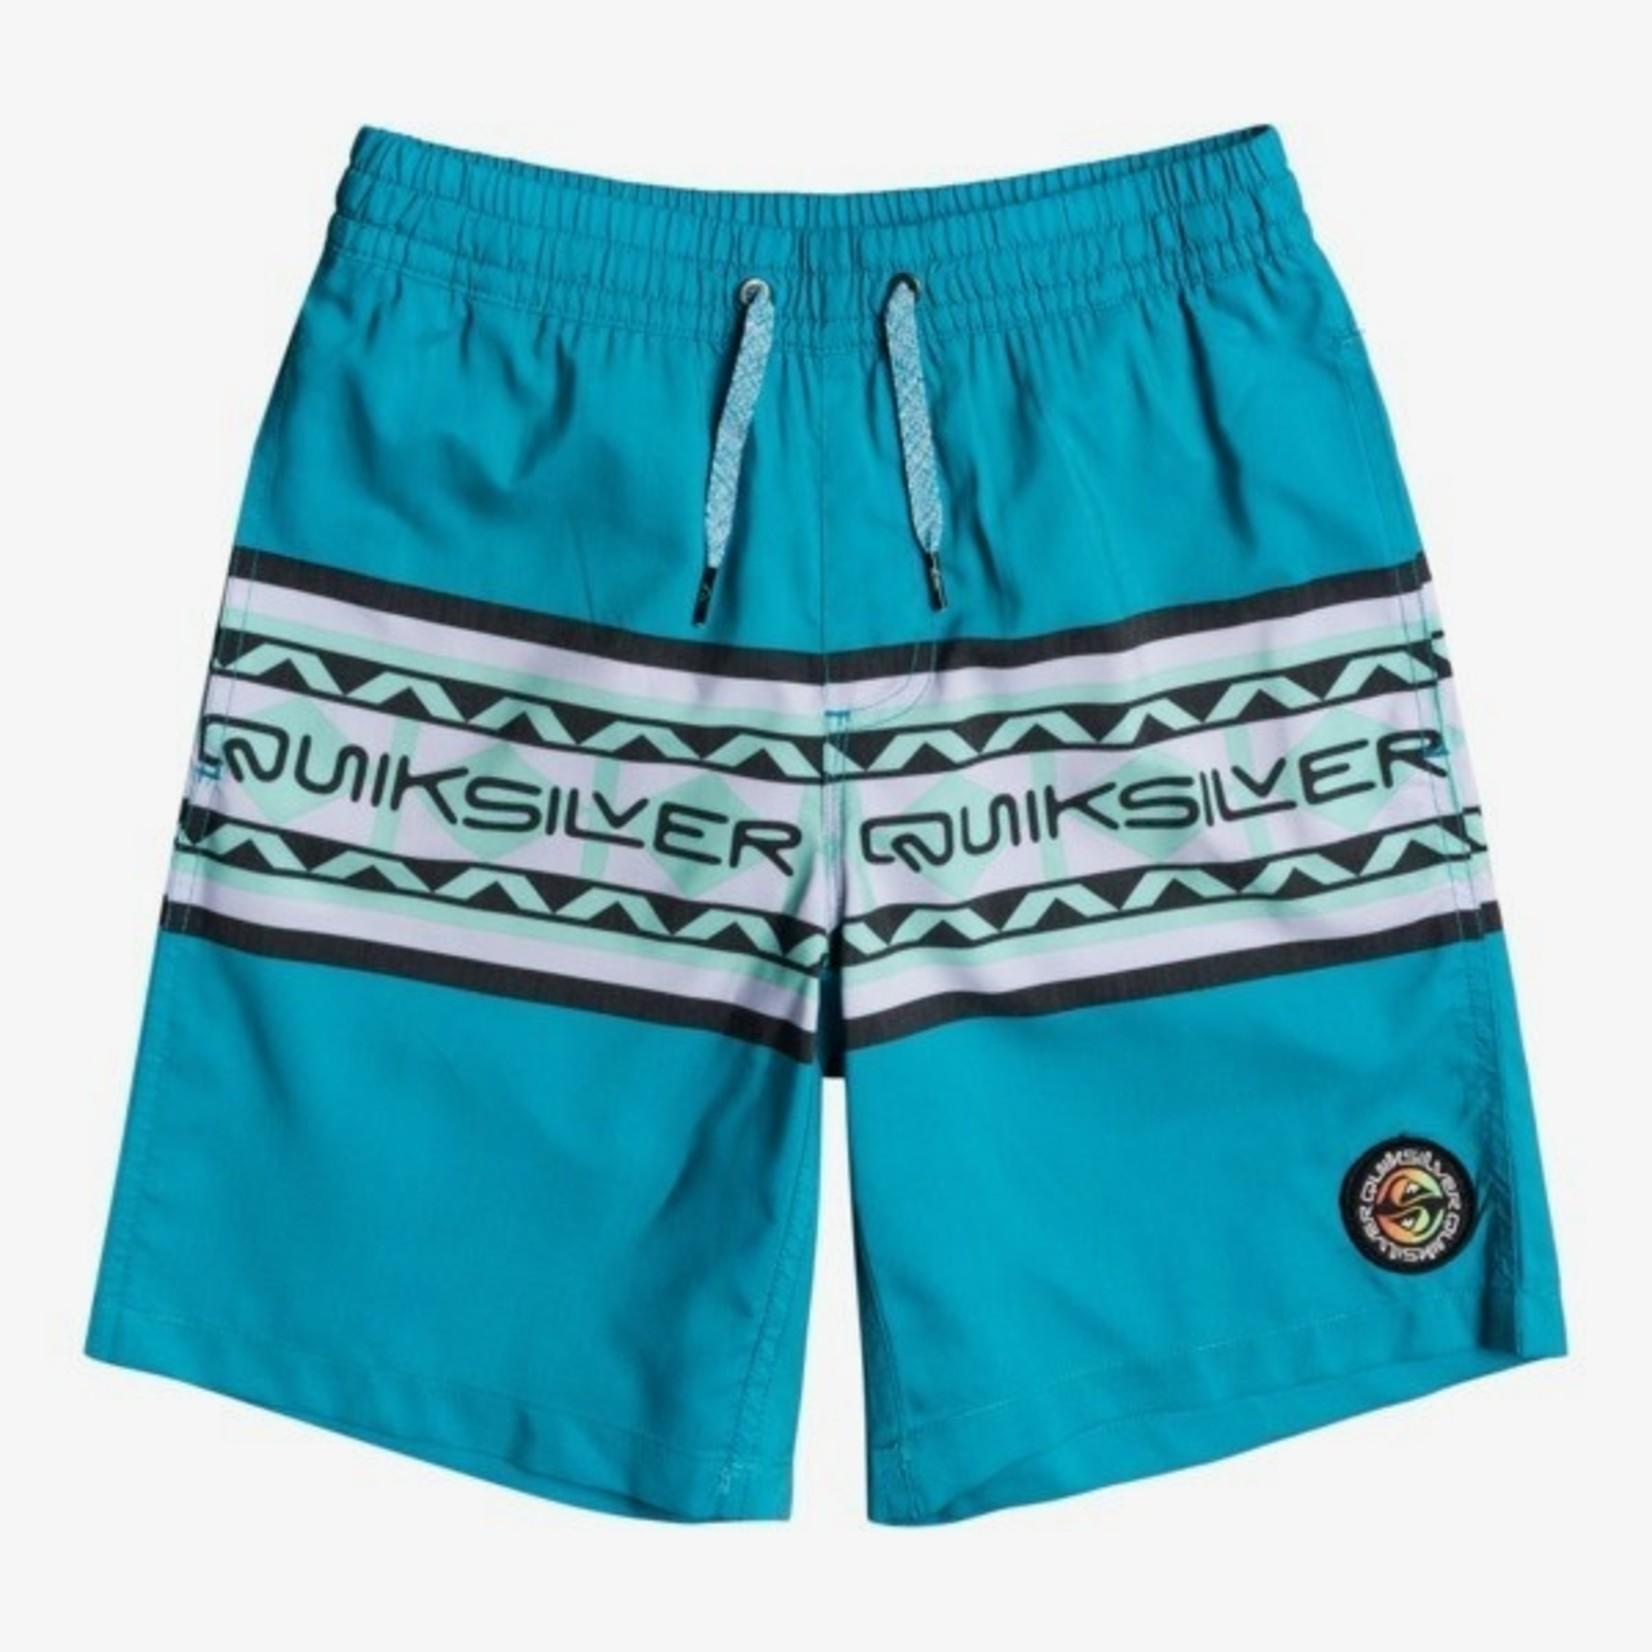 Quiksilver Quiksilver Sun Faded Youth Shorts